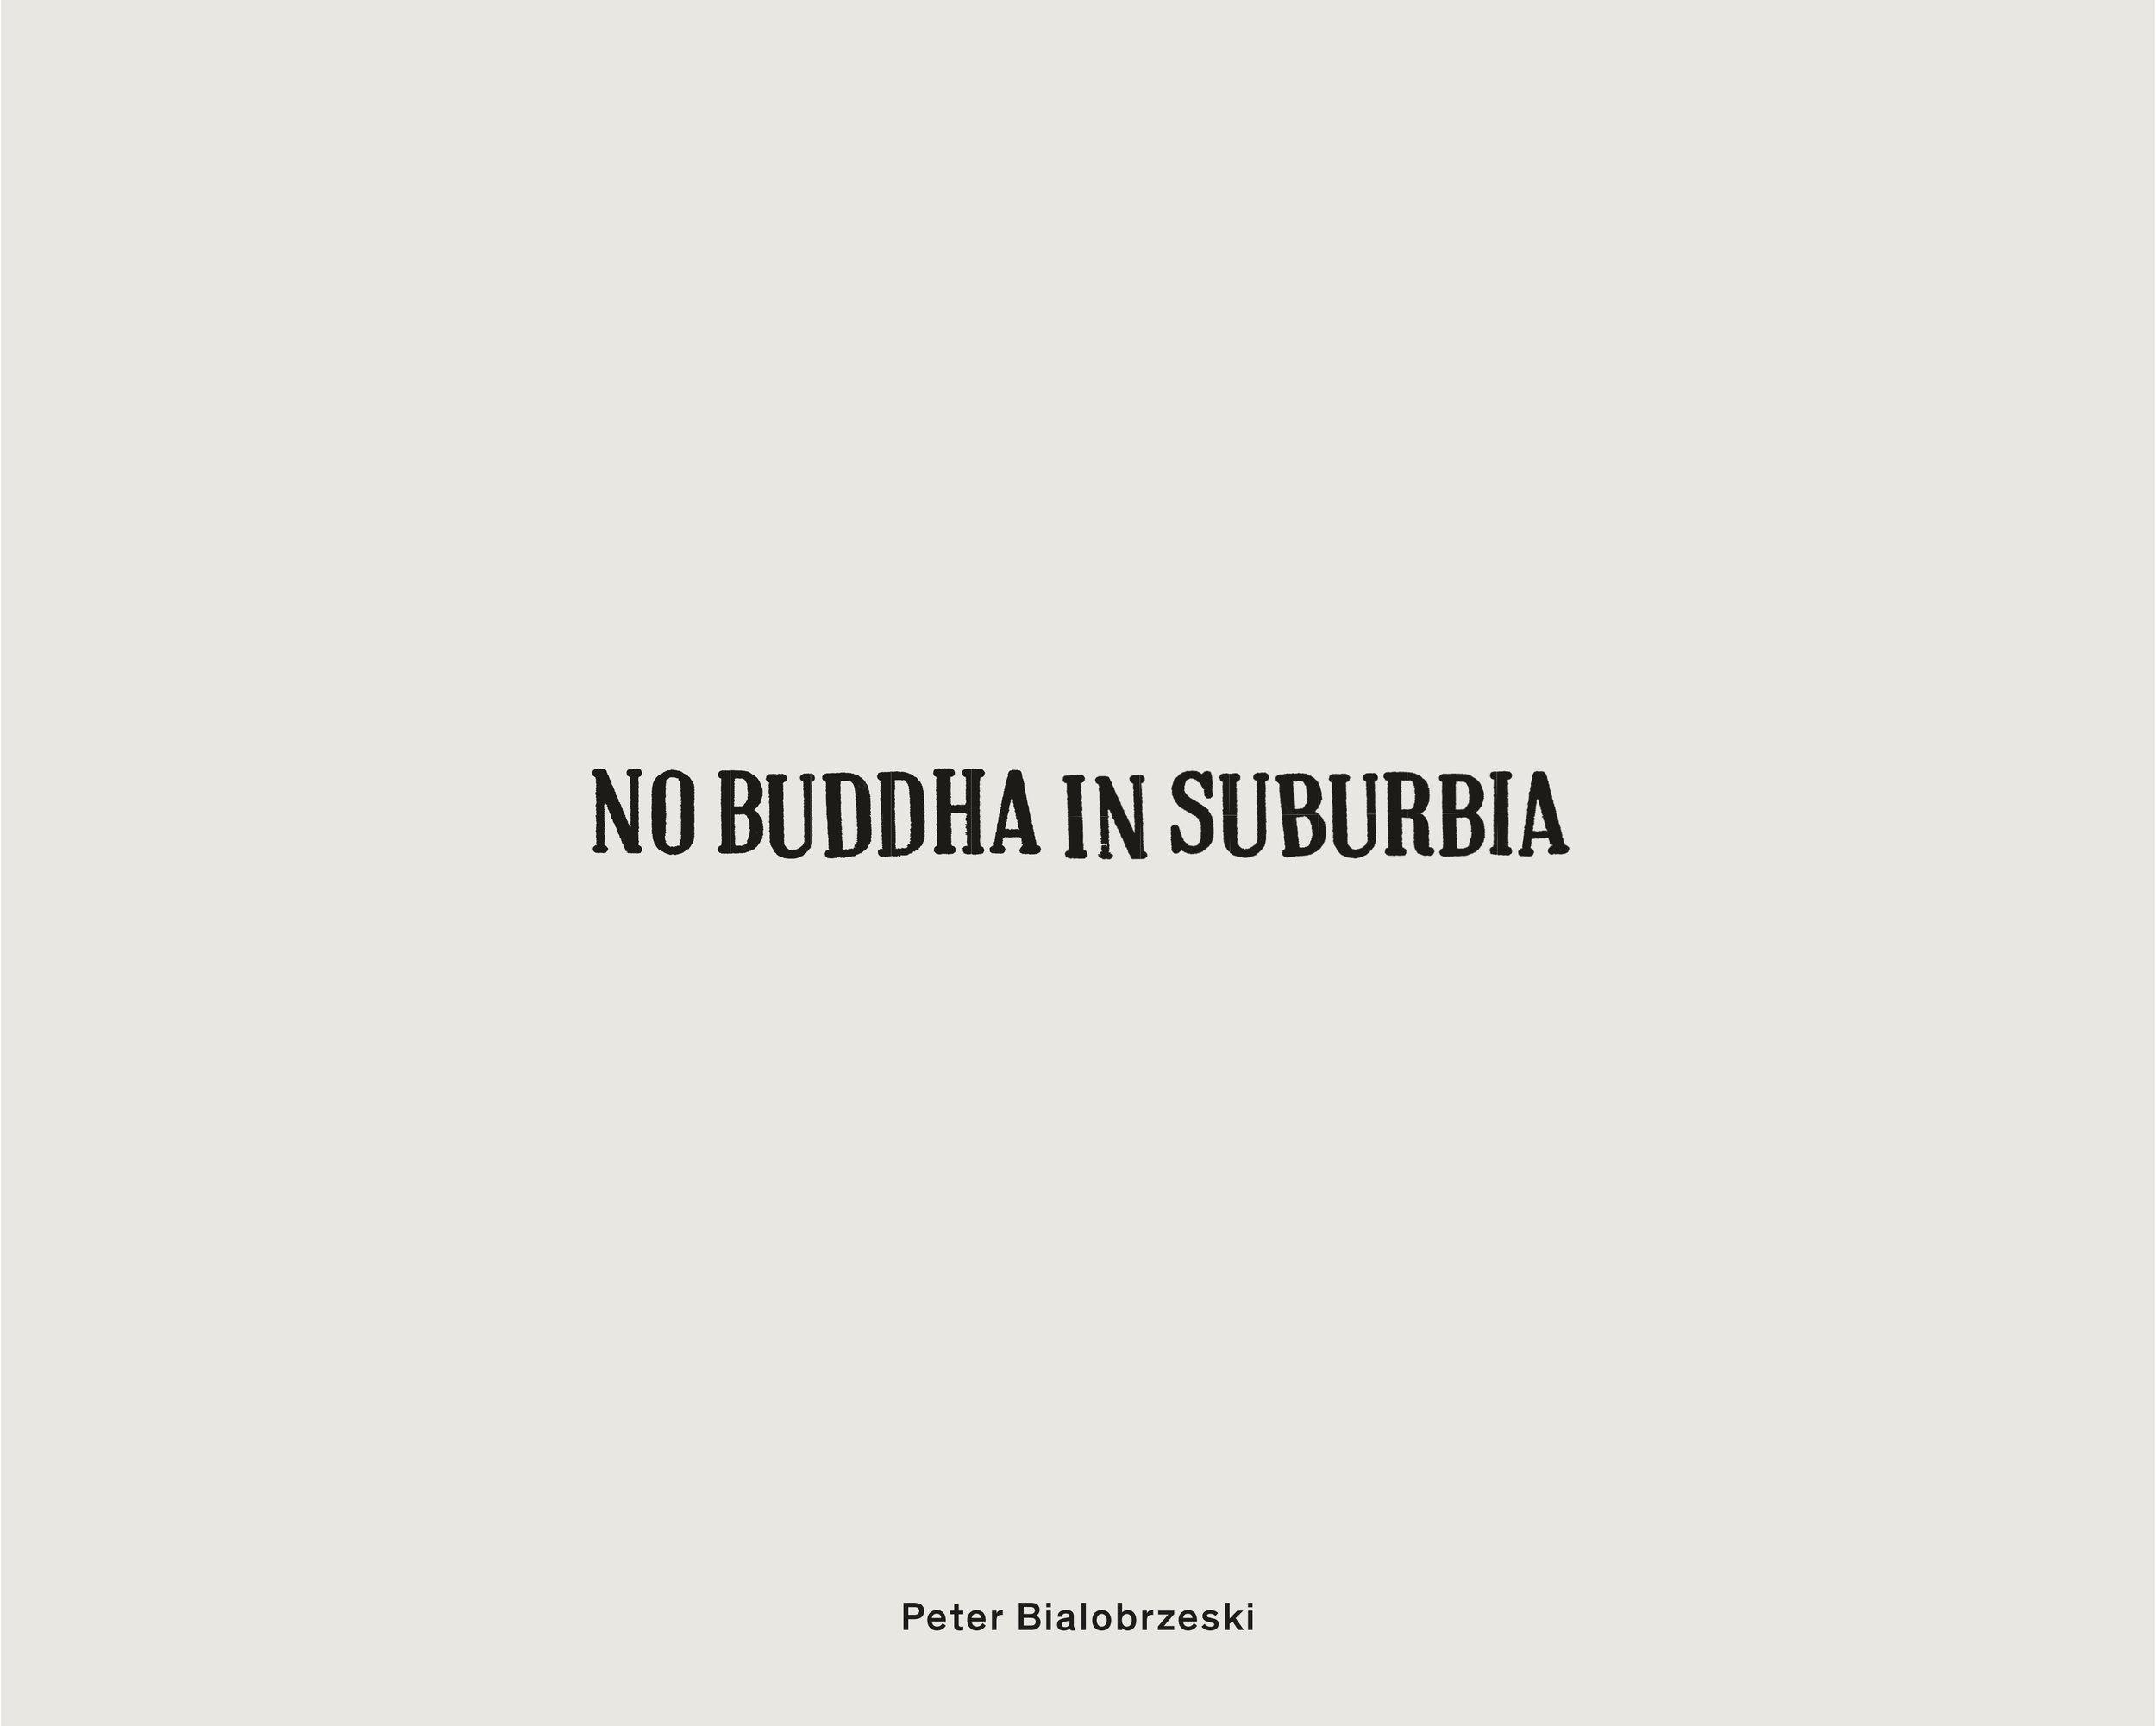 Peter Bialobrzeski NoBuddha in Suburbia Cover.jpg